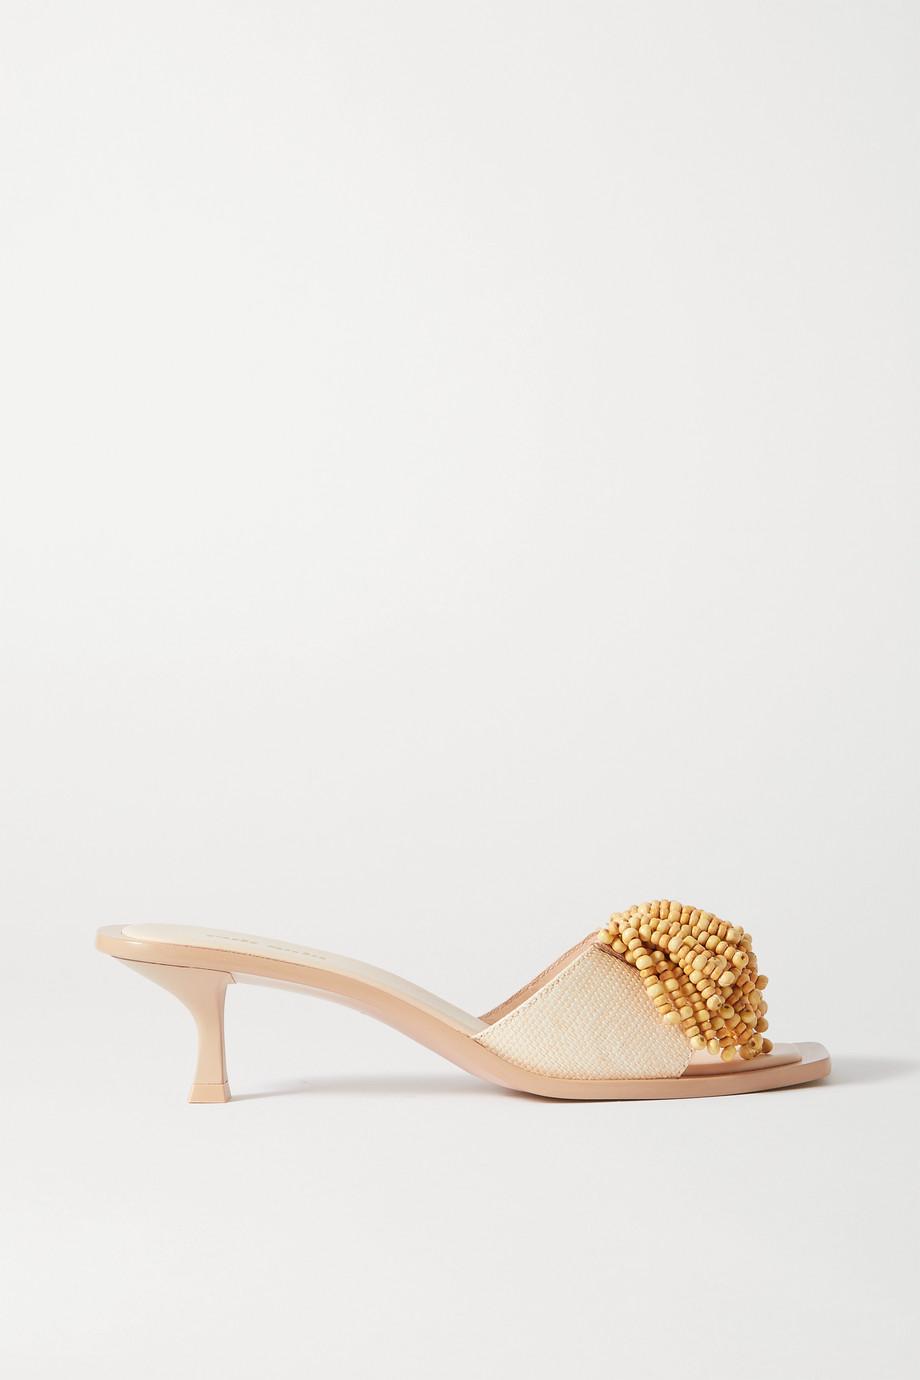 Cult Gaia Uma 珠饰拉菲草皮革穆勒鞋